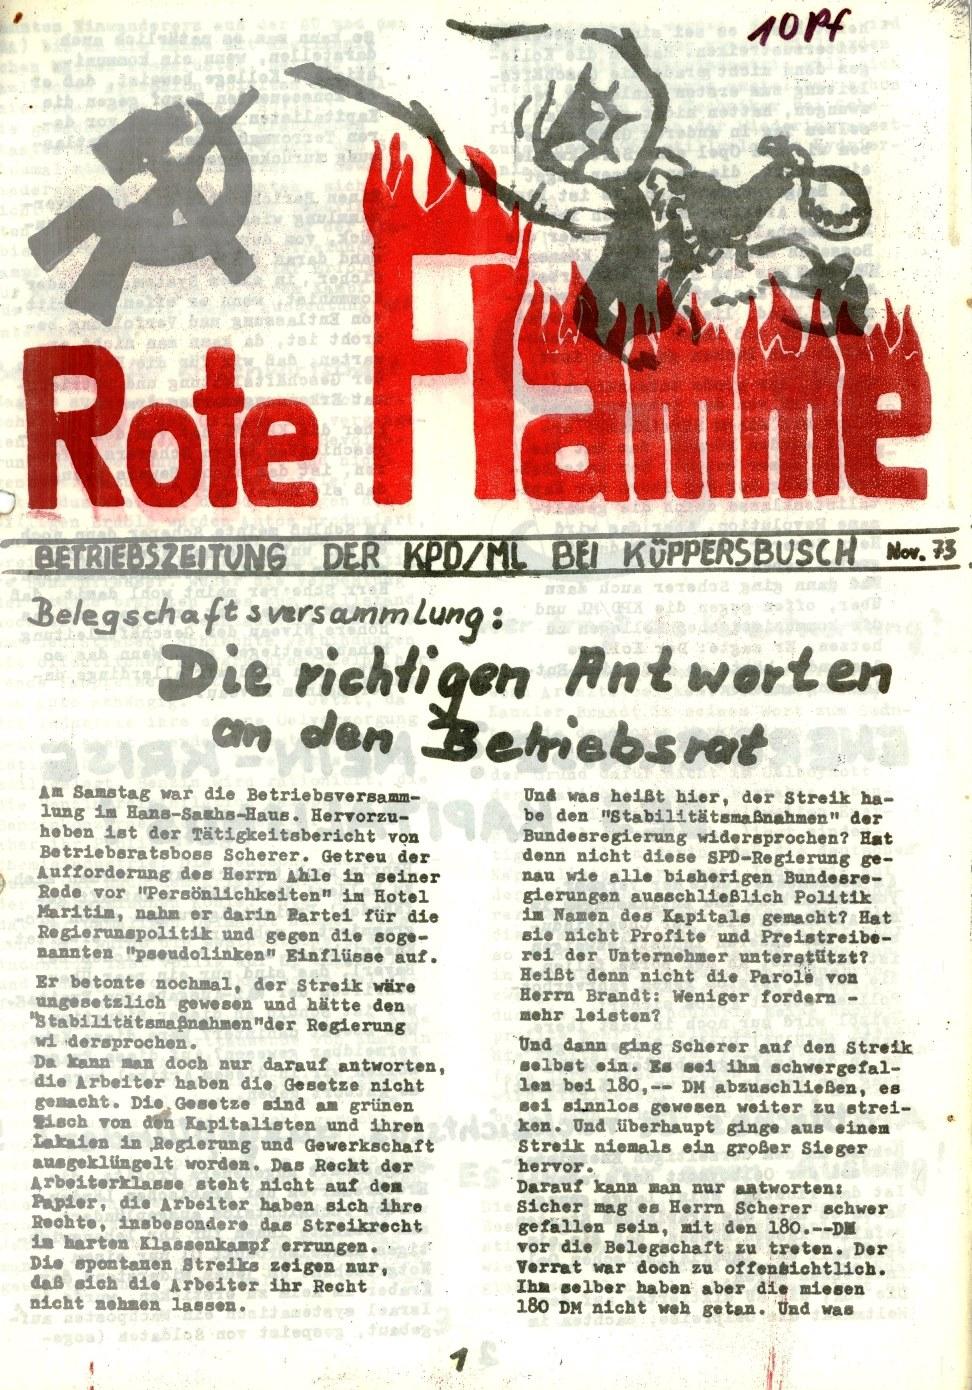 Rote_Flamme_1973_November_01